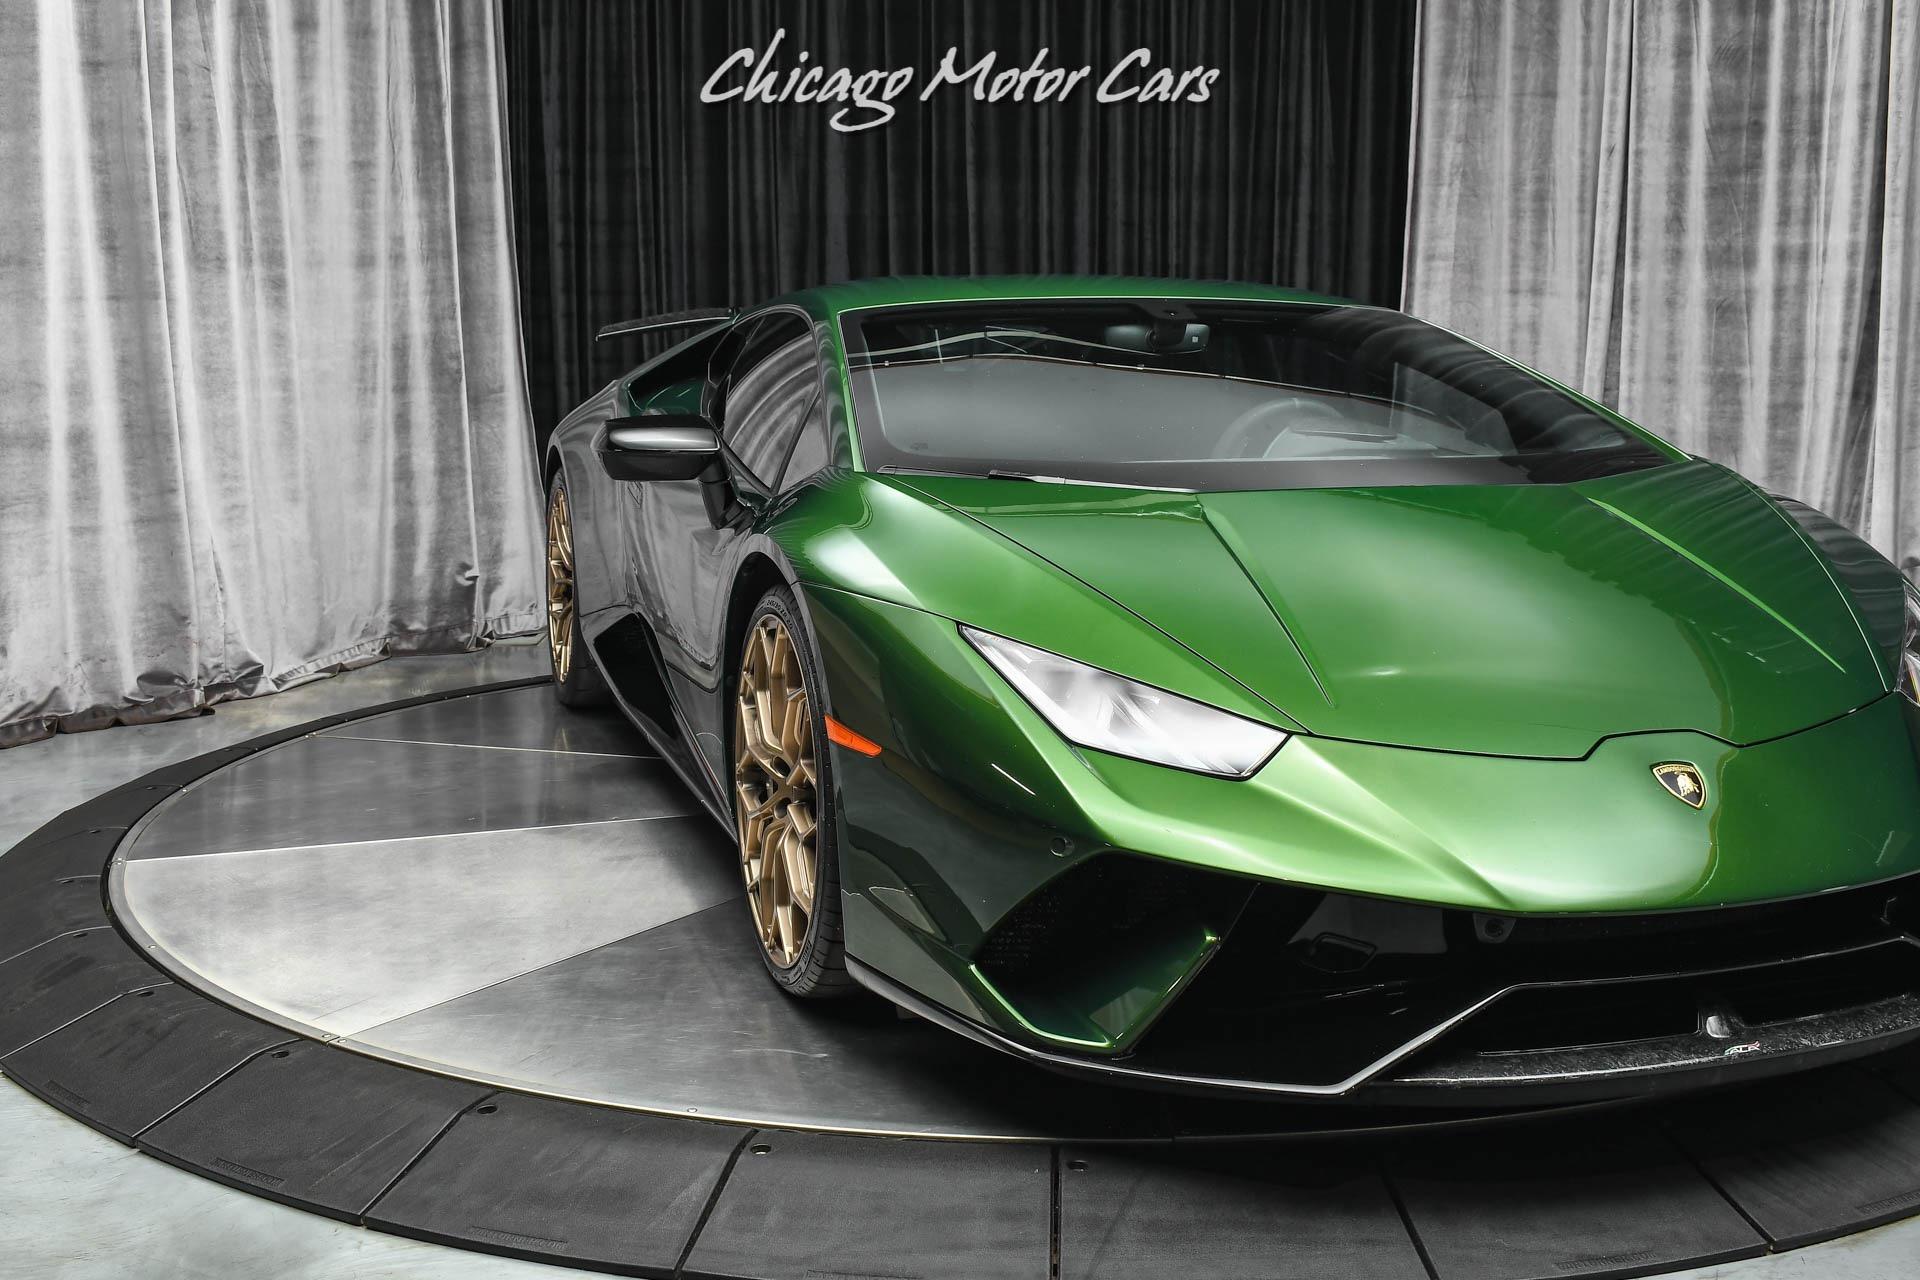 Used-2018-Lamborghini-Huracan-Performante-LP640-4-Coupe-FULLY-LOADED-RARE-VERDE-ERMES-COLOR